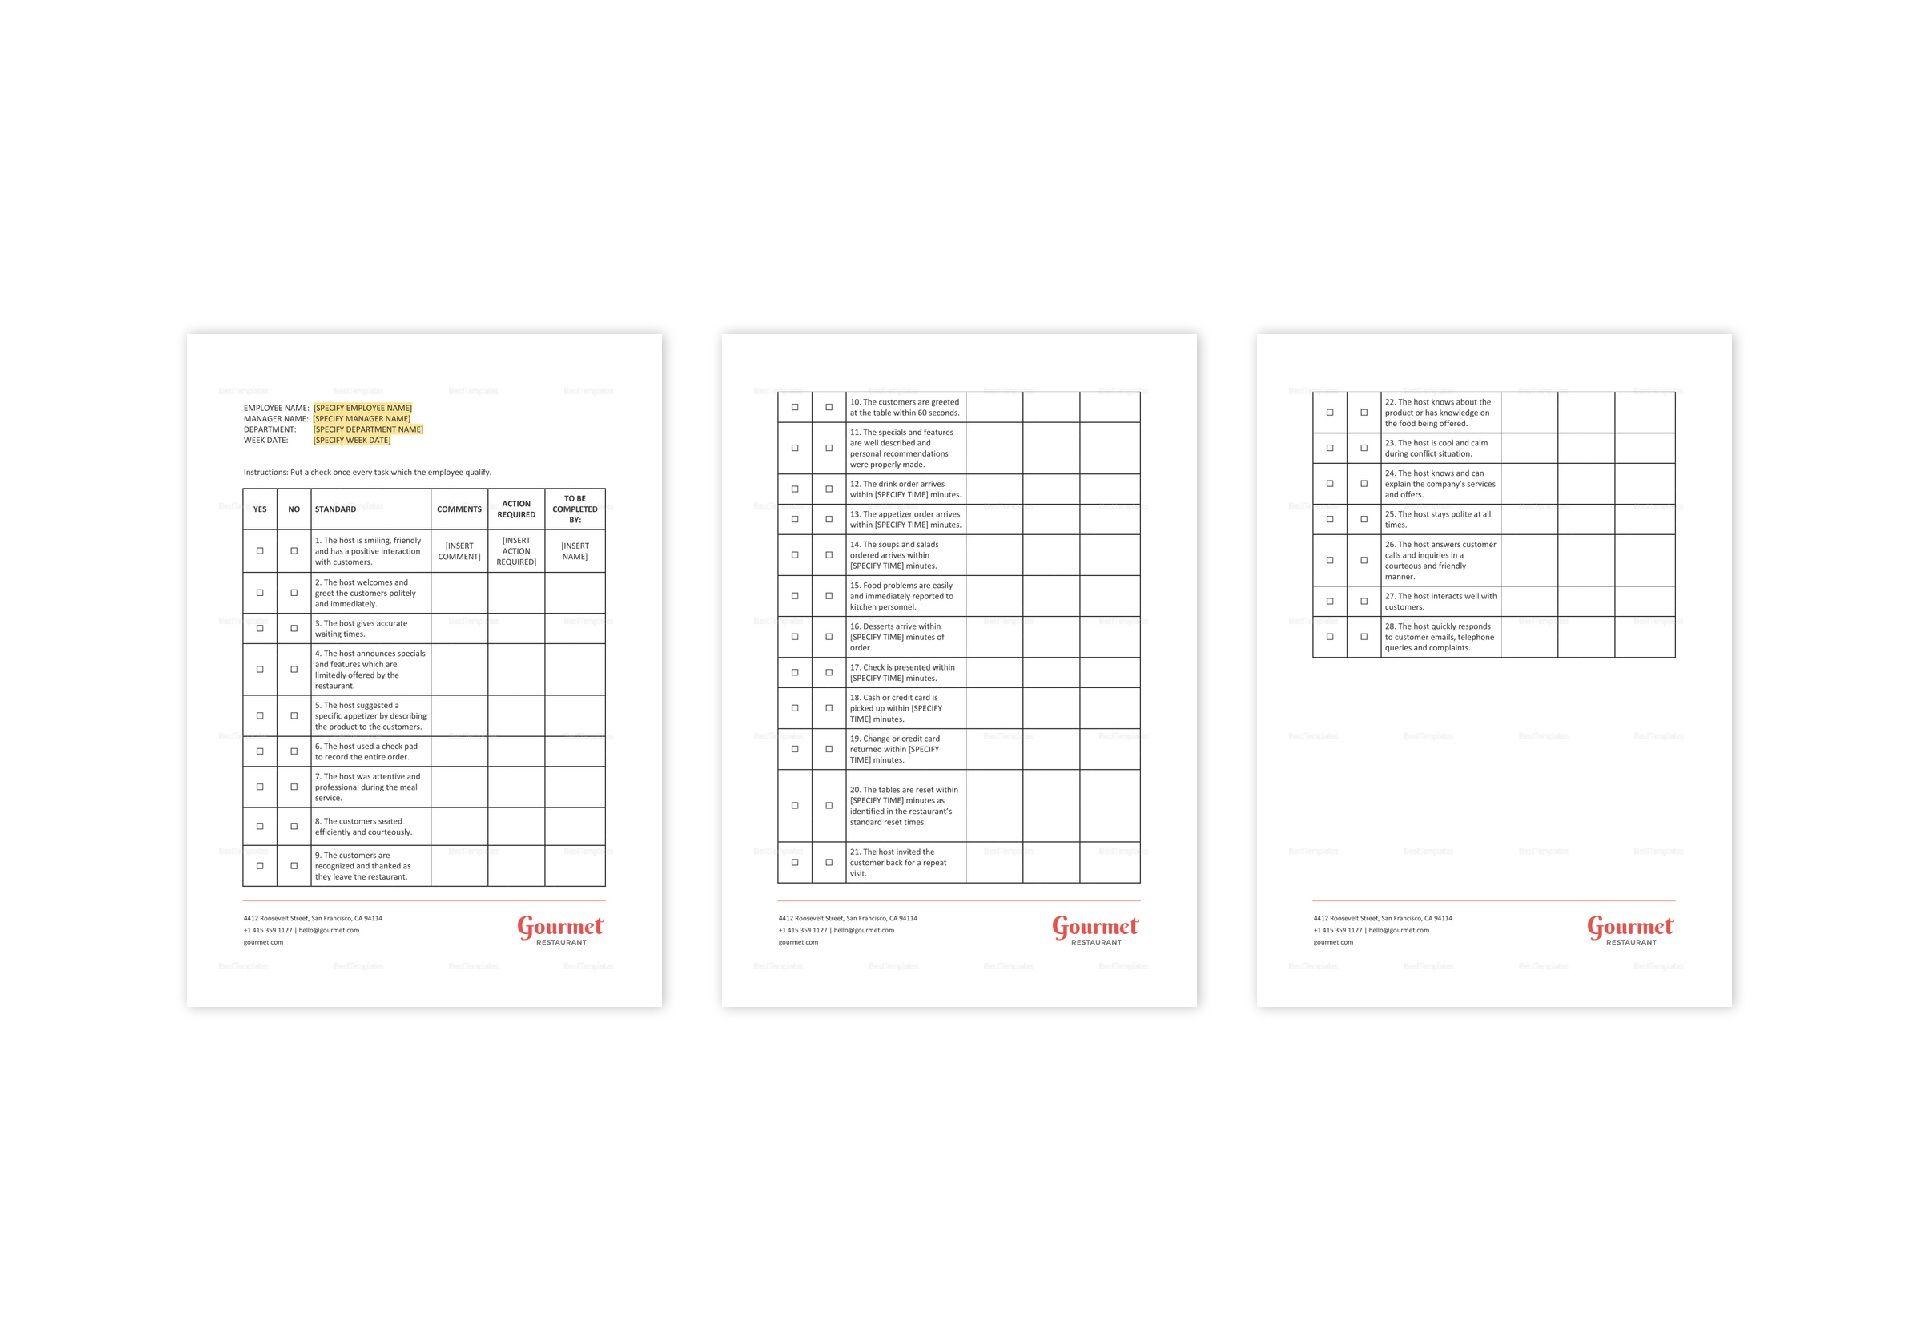 Restaurant Customer Service Checklist Template in MS Word